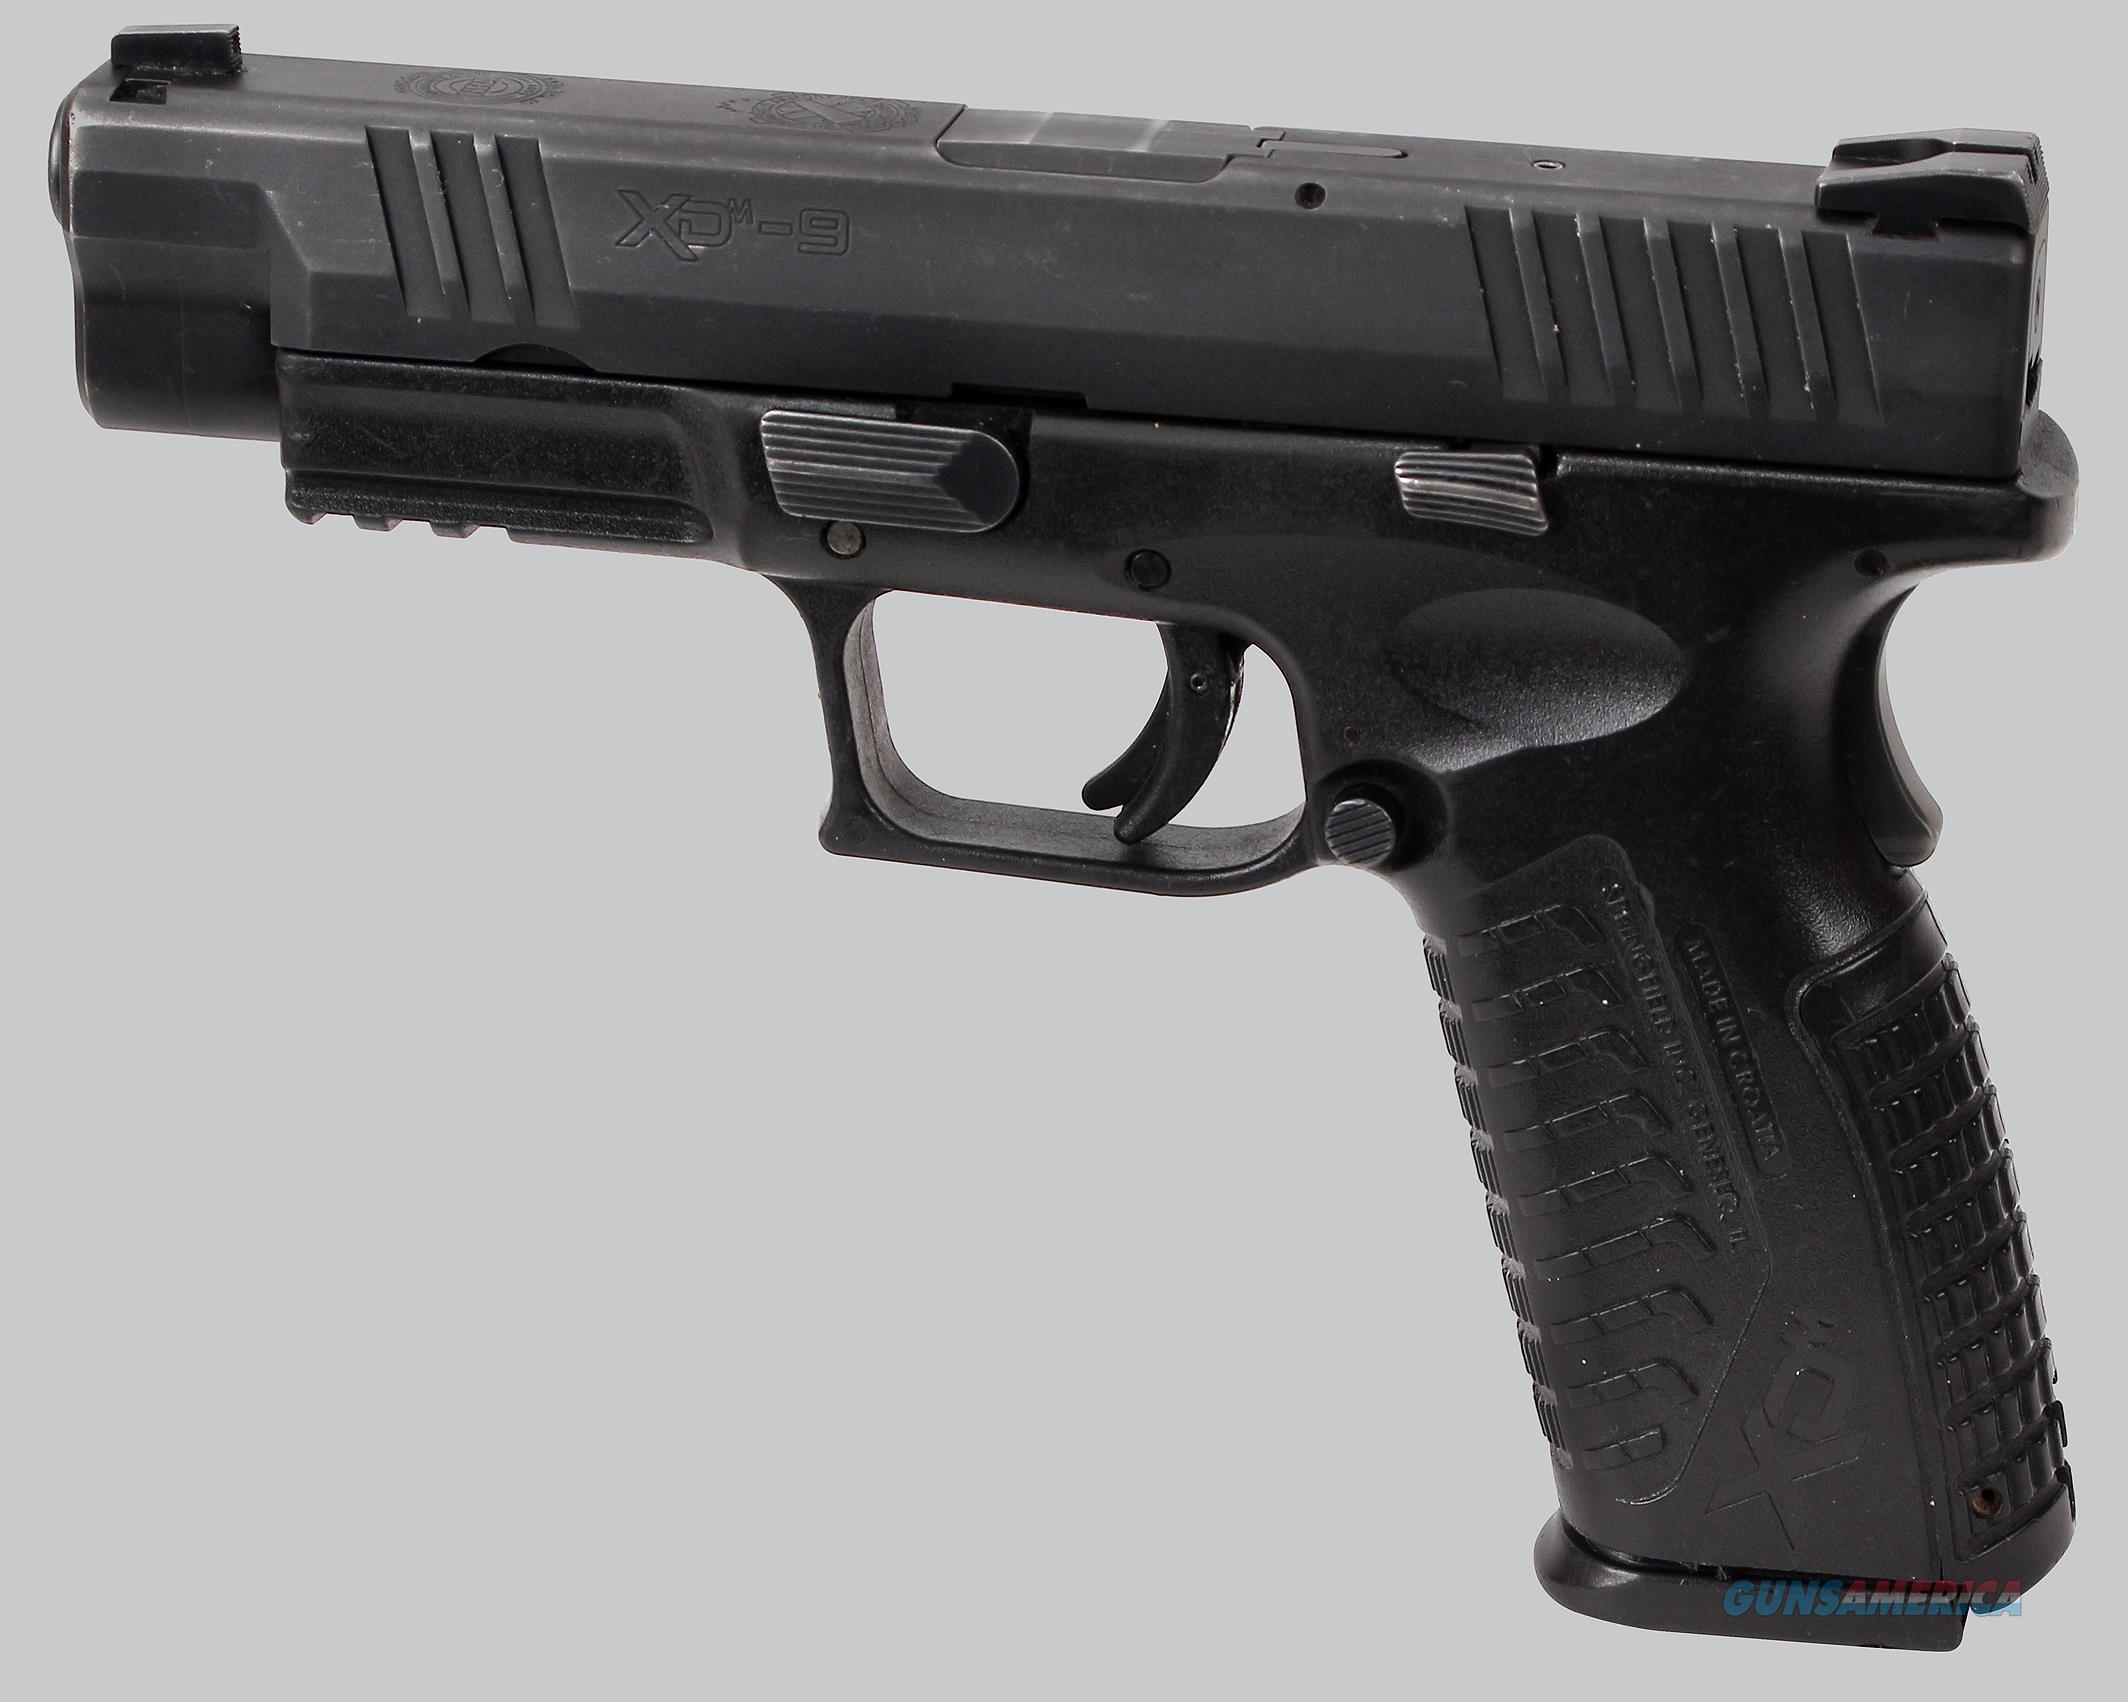 Springfield Armory 9mm XDM Pistol  Guns > Pistols > Springfield Armory Pistols > XD-M